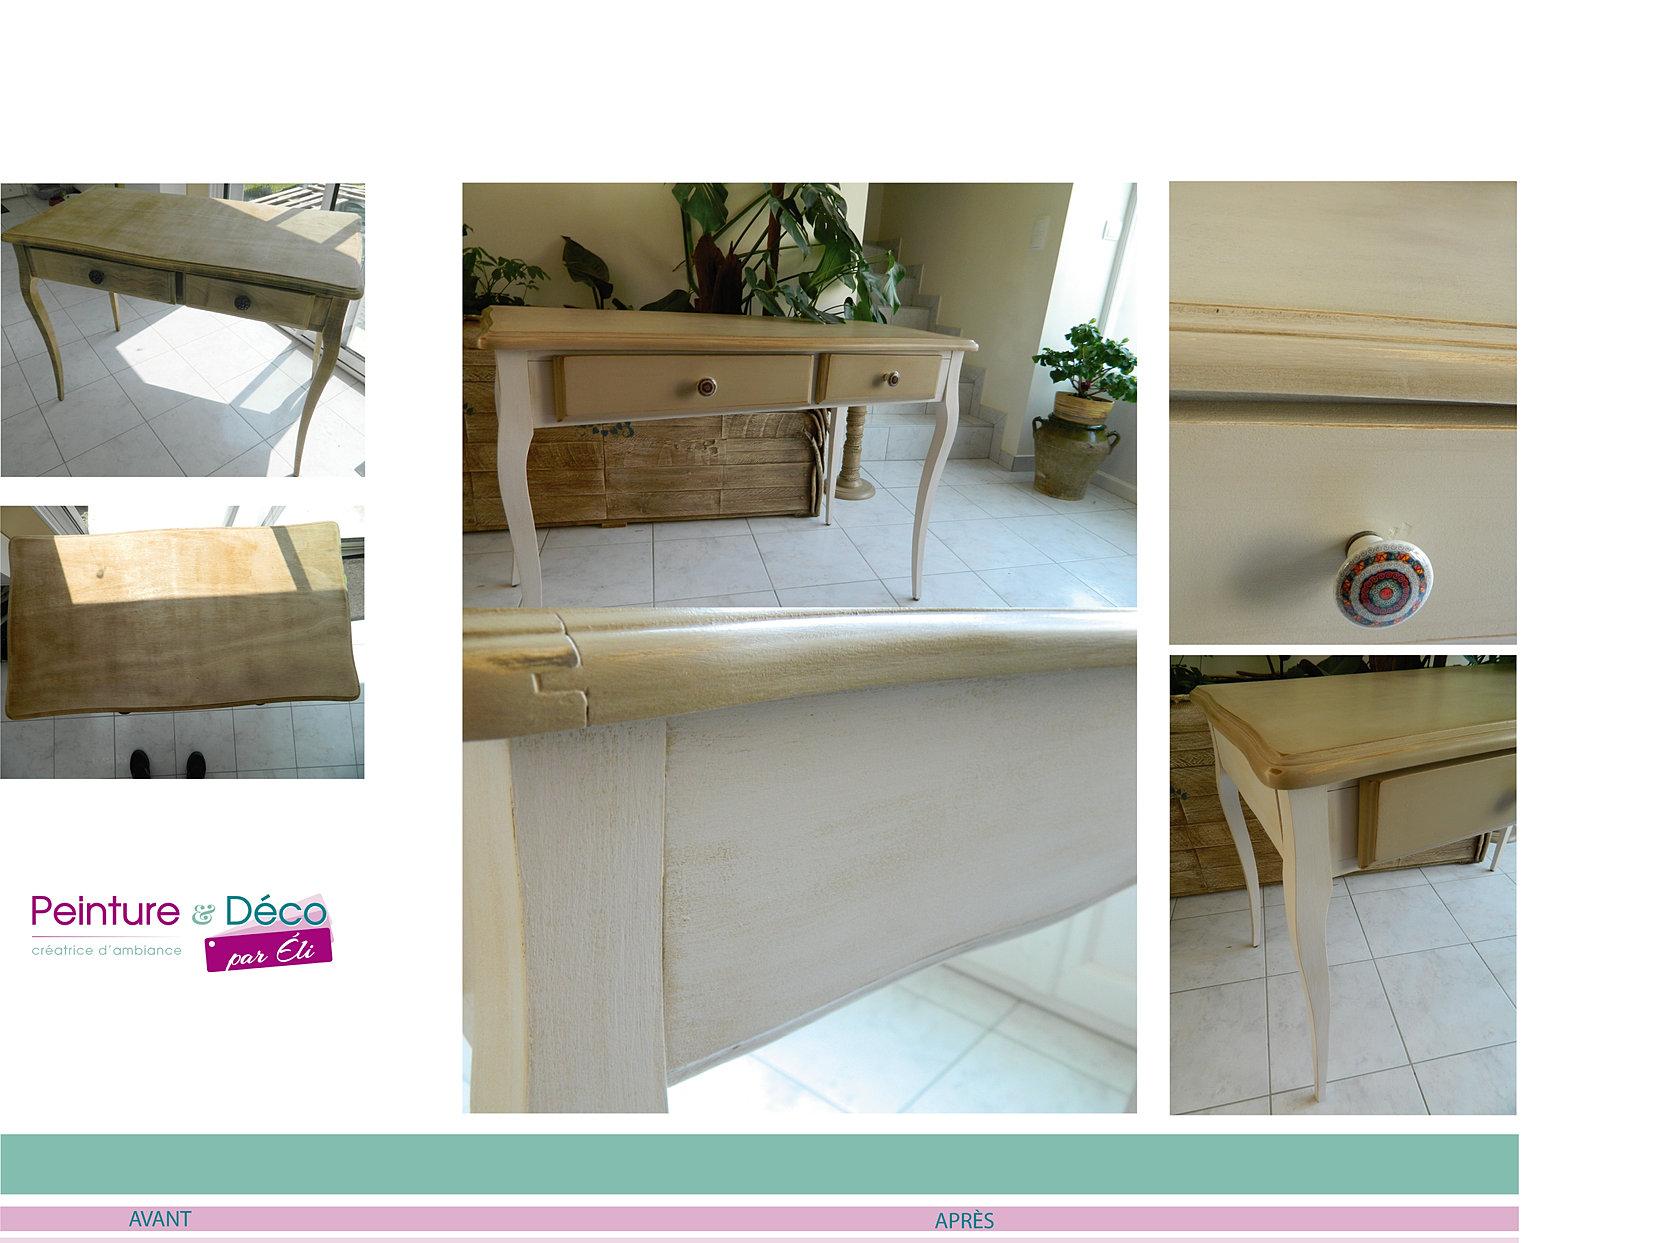 relooking meubles france peinture d co par li. Black Bedroom Furniture Sets. Home Design Ideas